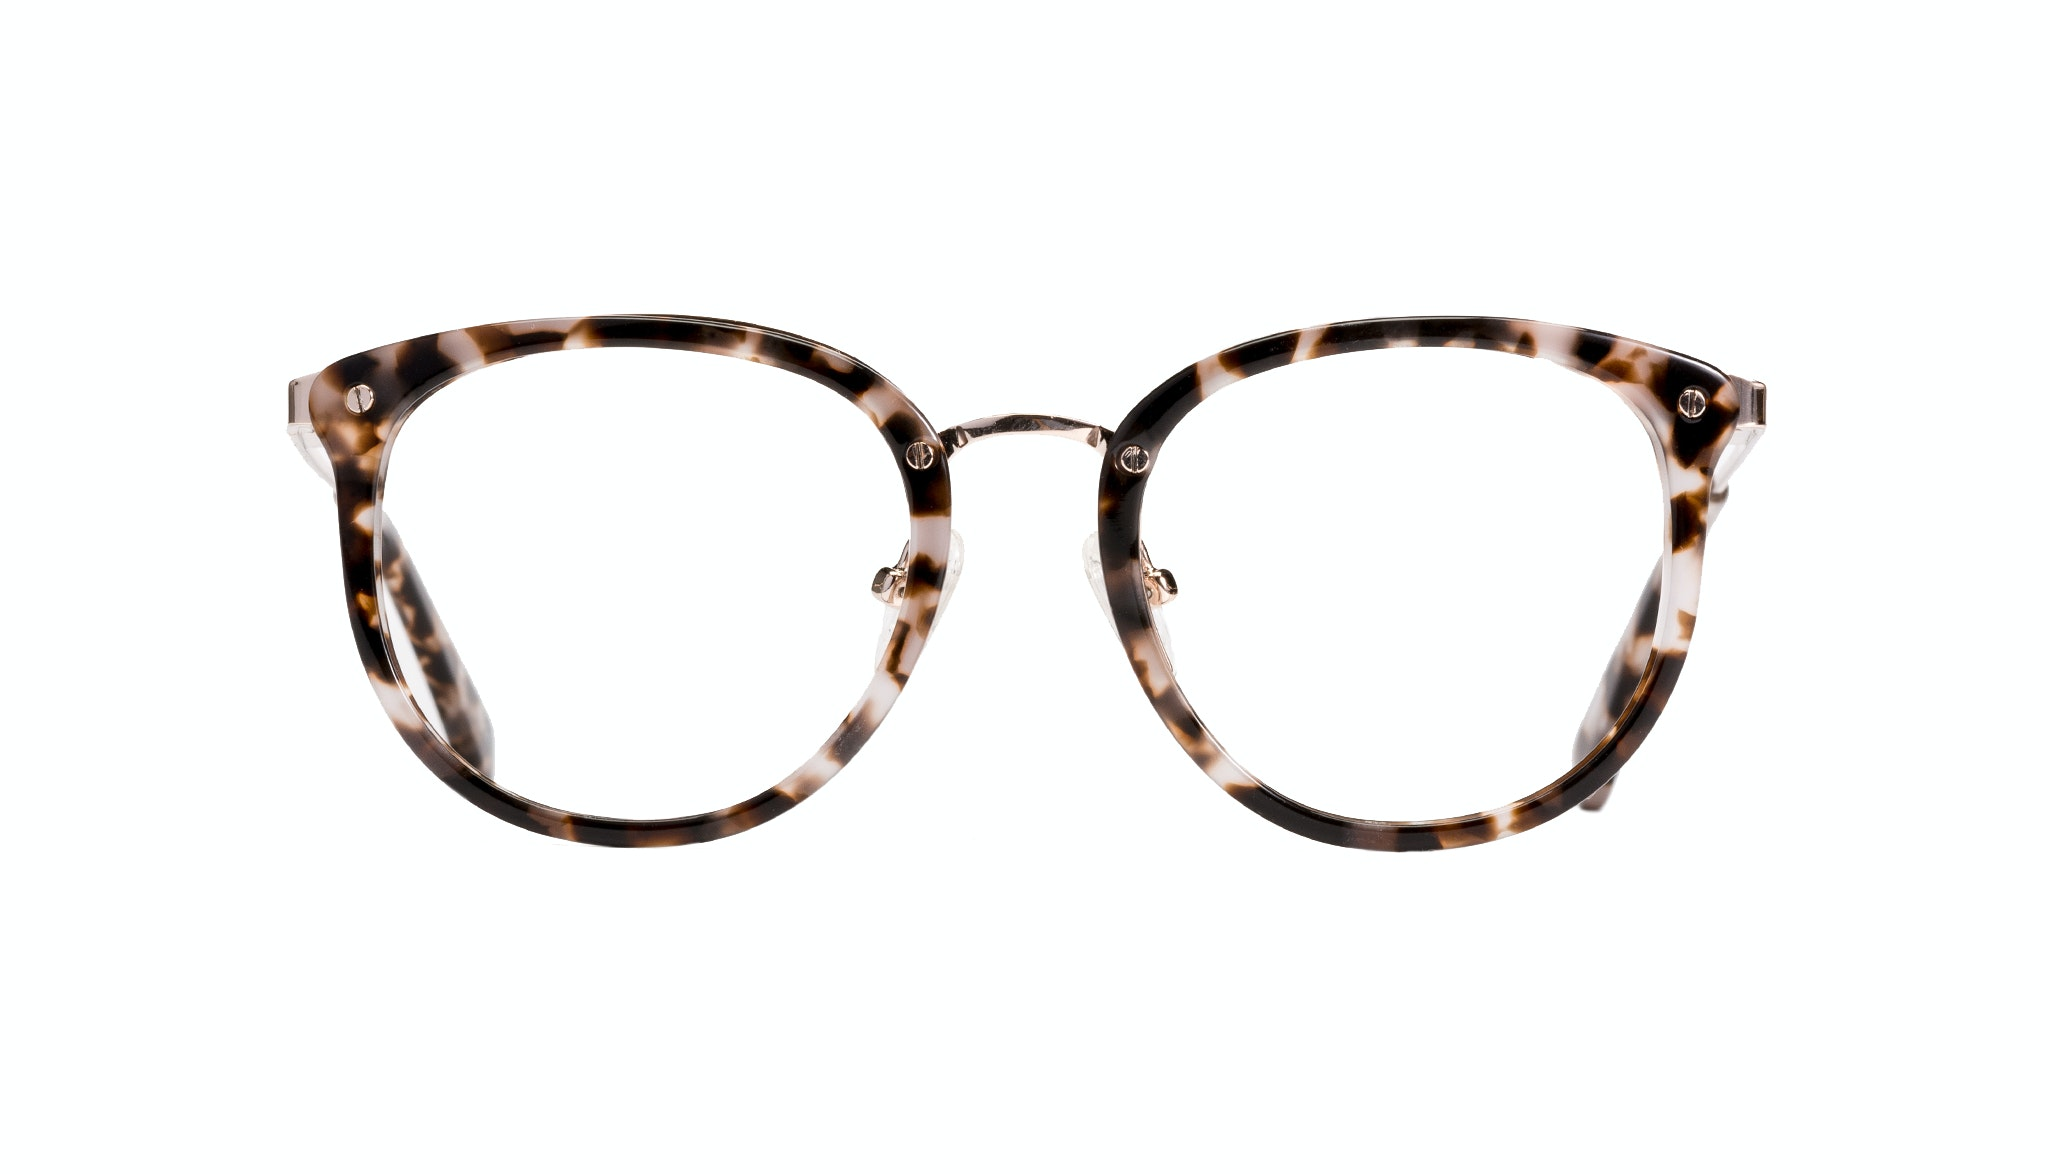 Affordable Fashion Glasses Cat Eye Round Eyeglasses Women Amaze Petite Mocha Tort